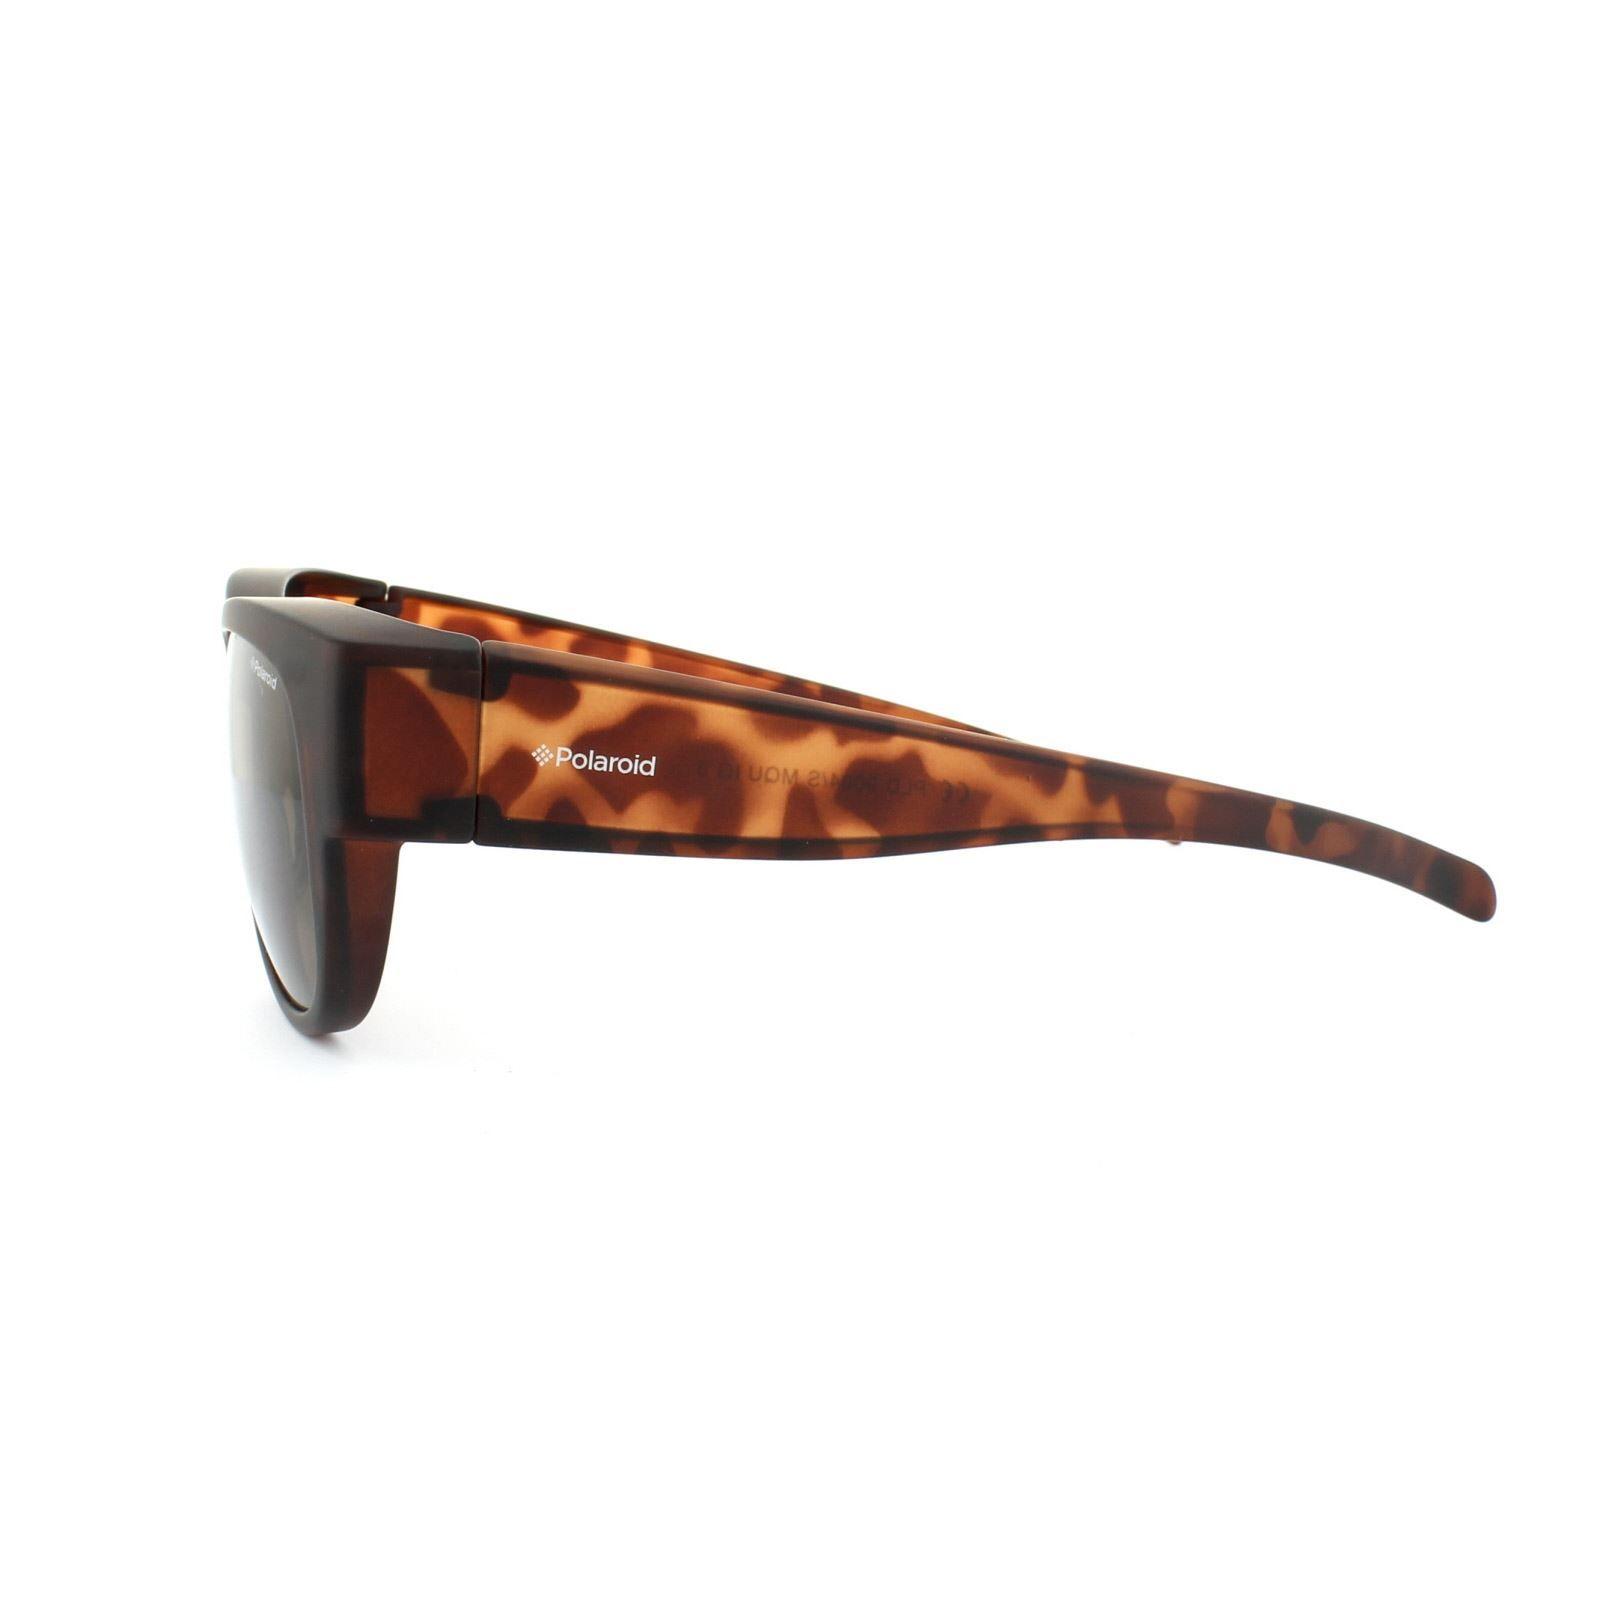 Polaroid Suncovers Fitover Sunglasses 9004/S MQU IG Dark Havana Brown Polarized